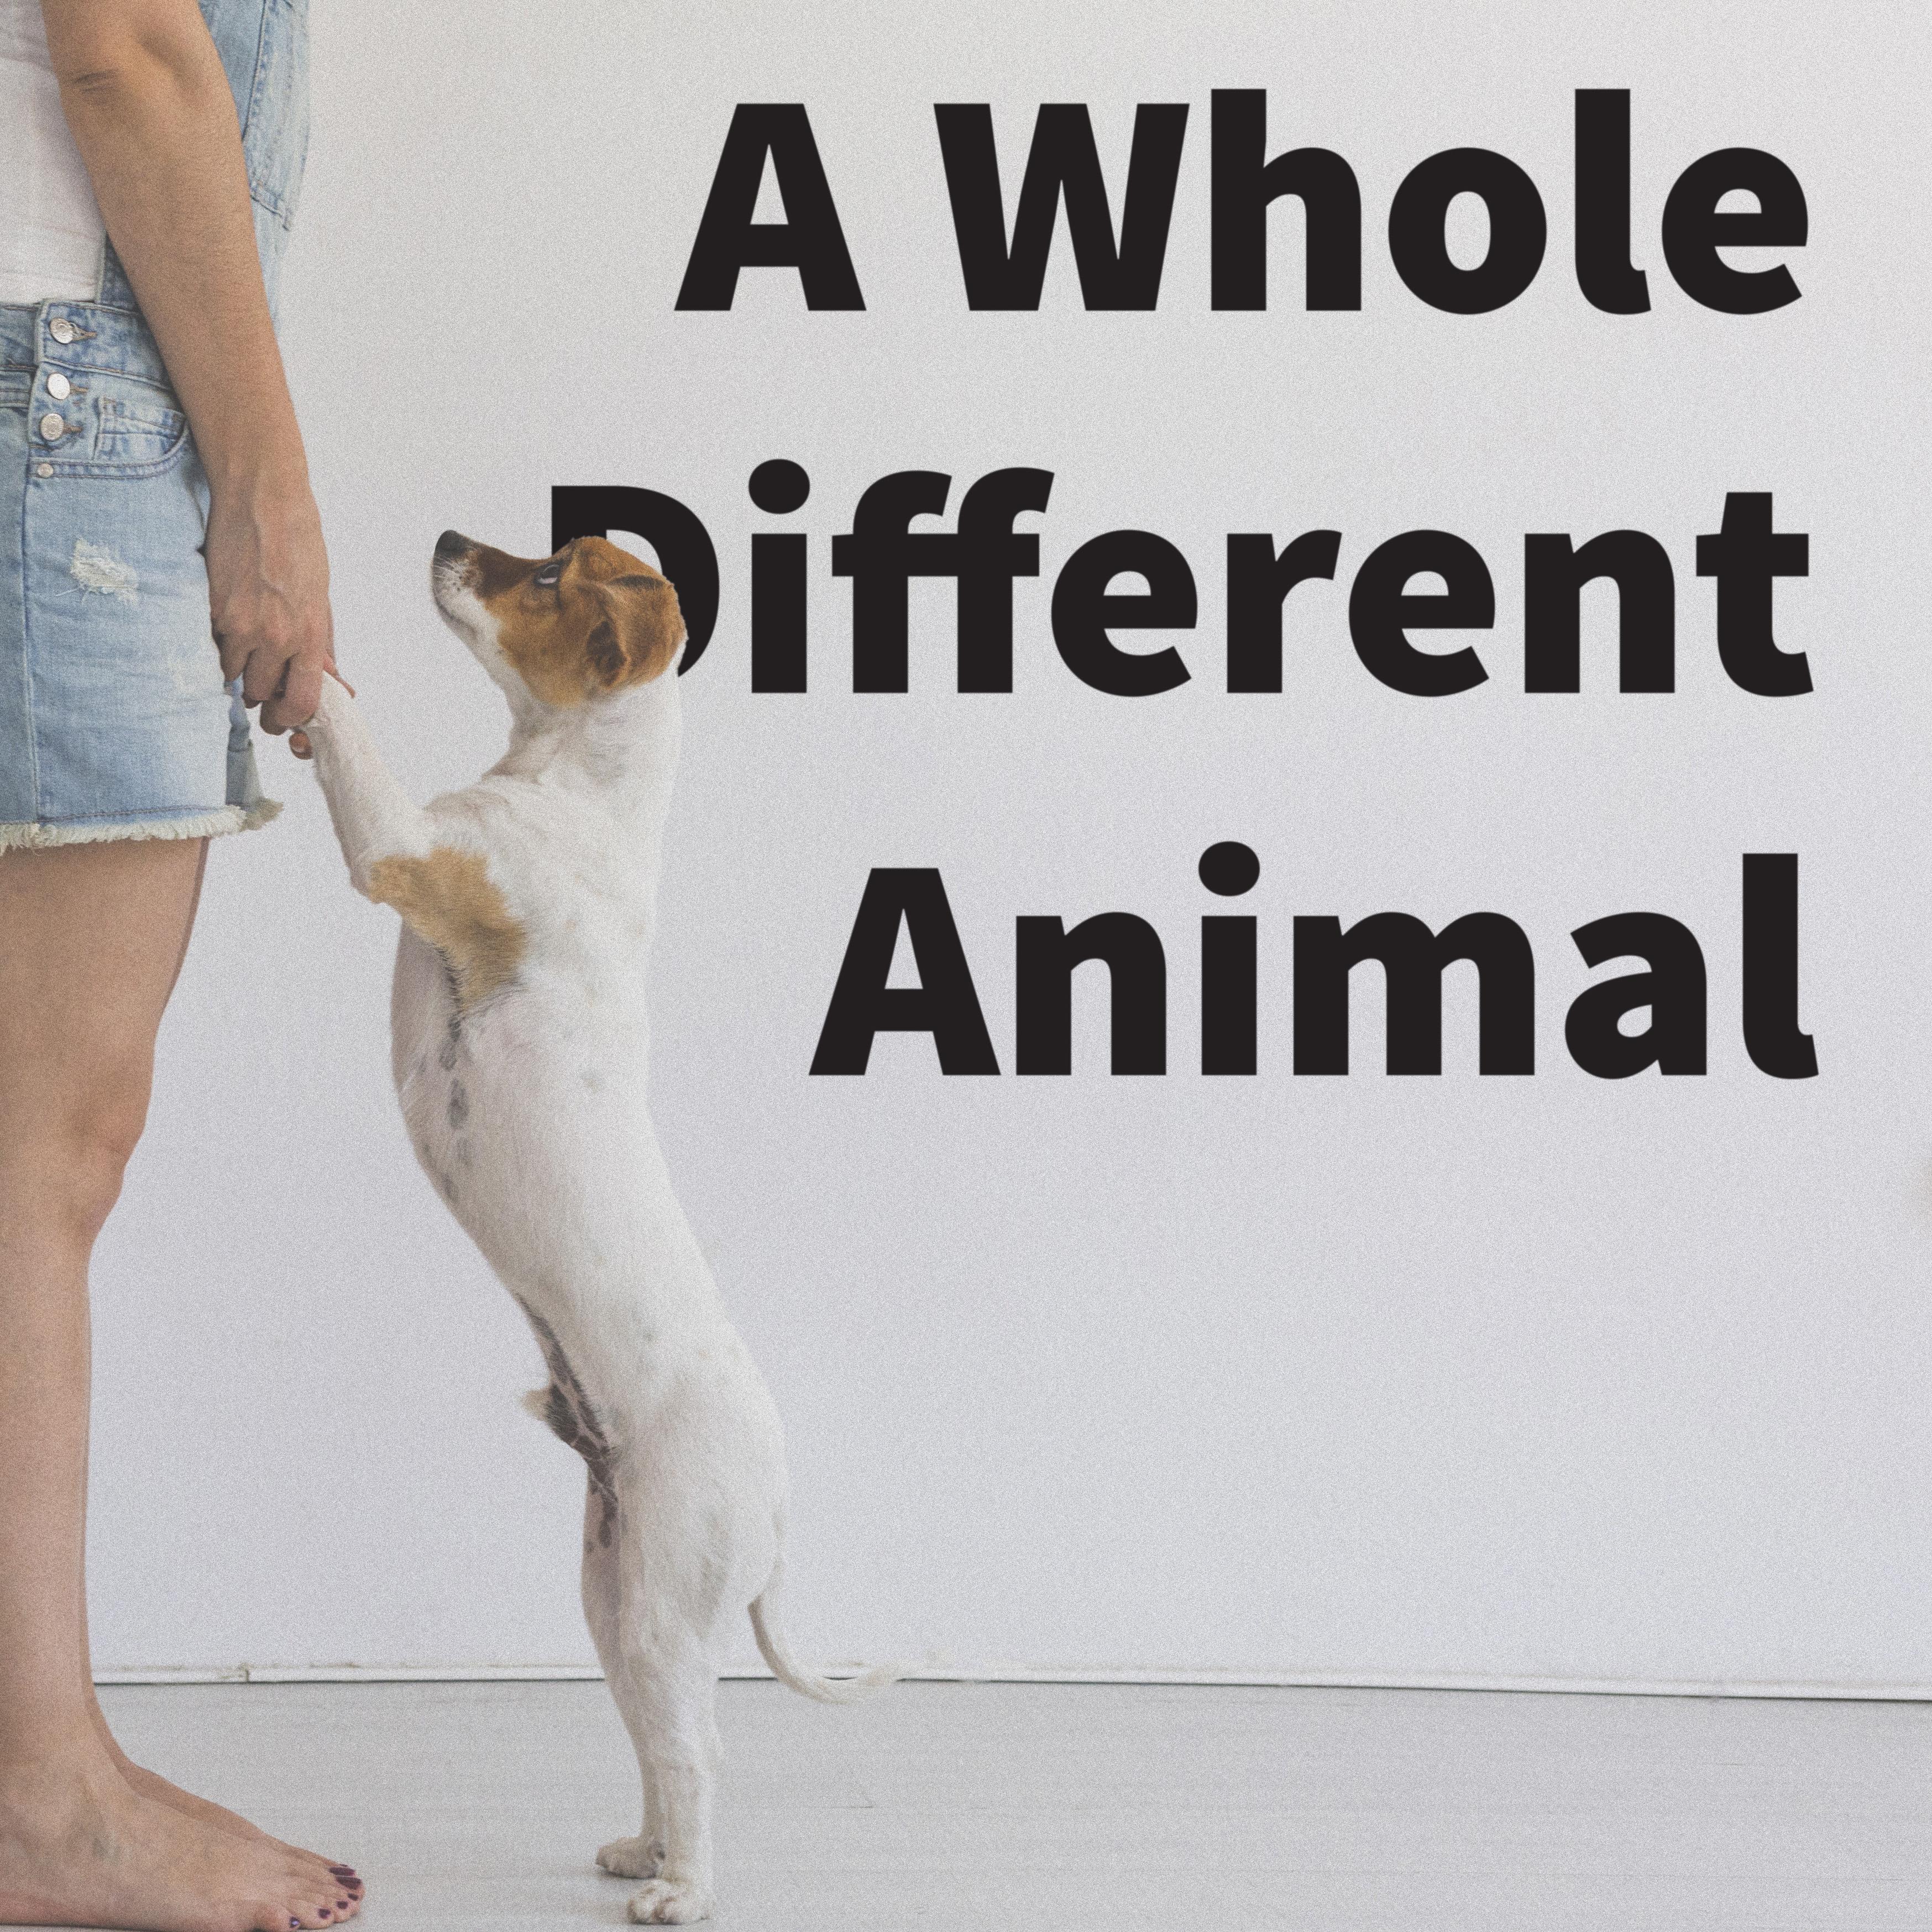 whole different animal blog.jpg